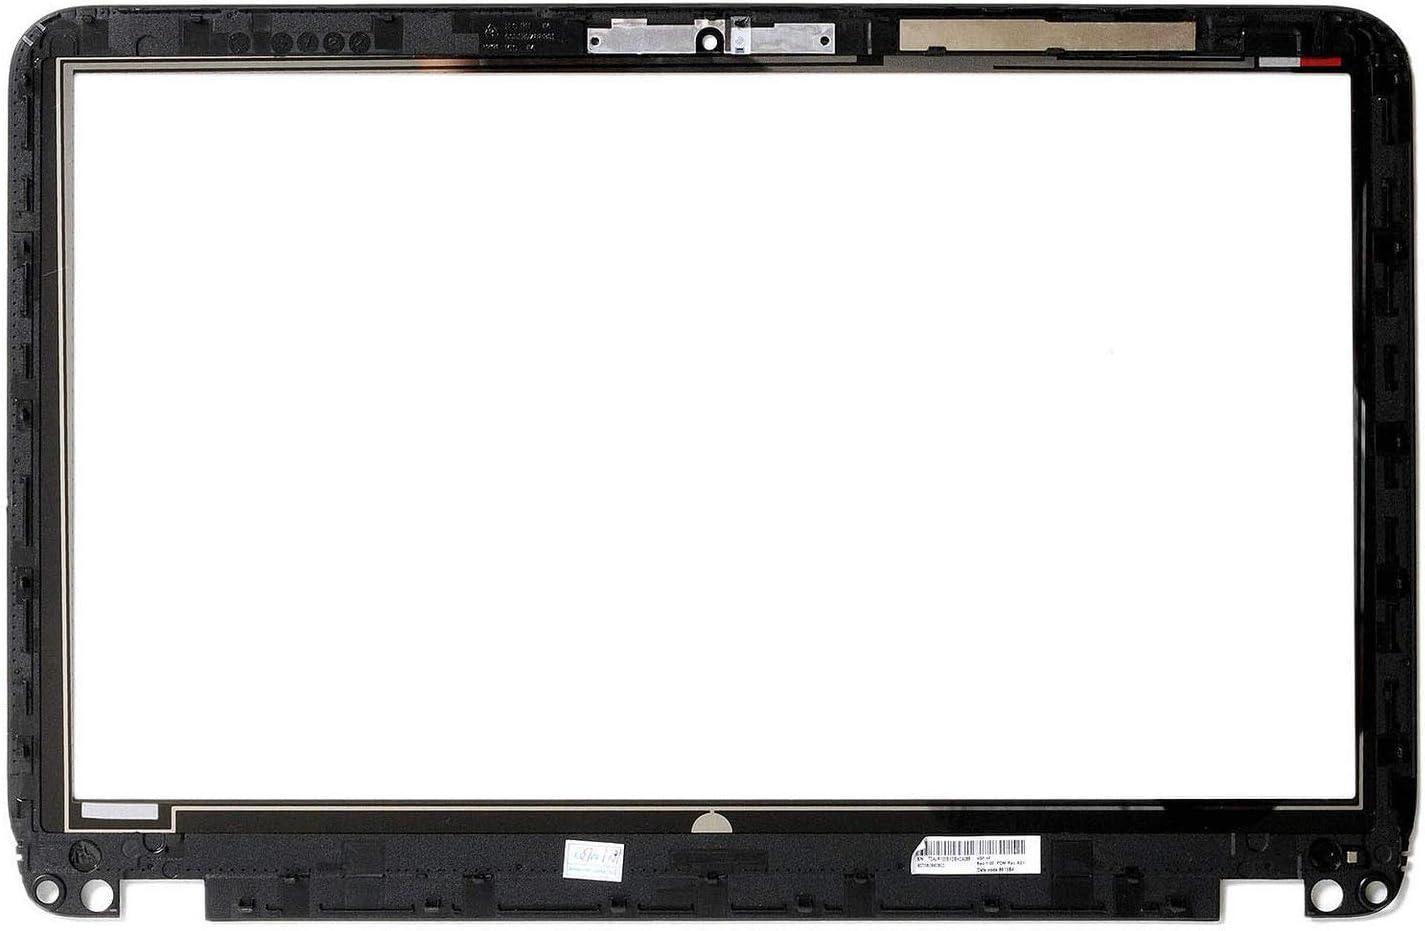 "HUAHAI 15.6"" Touch Screen Digitizer + Bezel for HP Envy TouchSmart 15-J (TCP15G06 V1.0)"